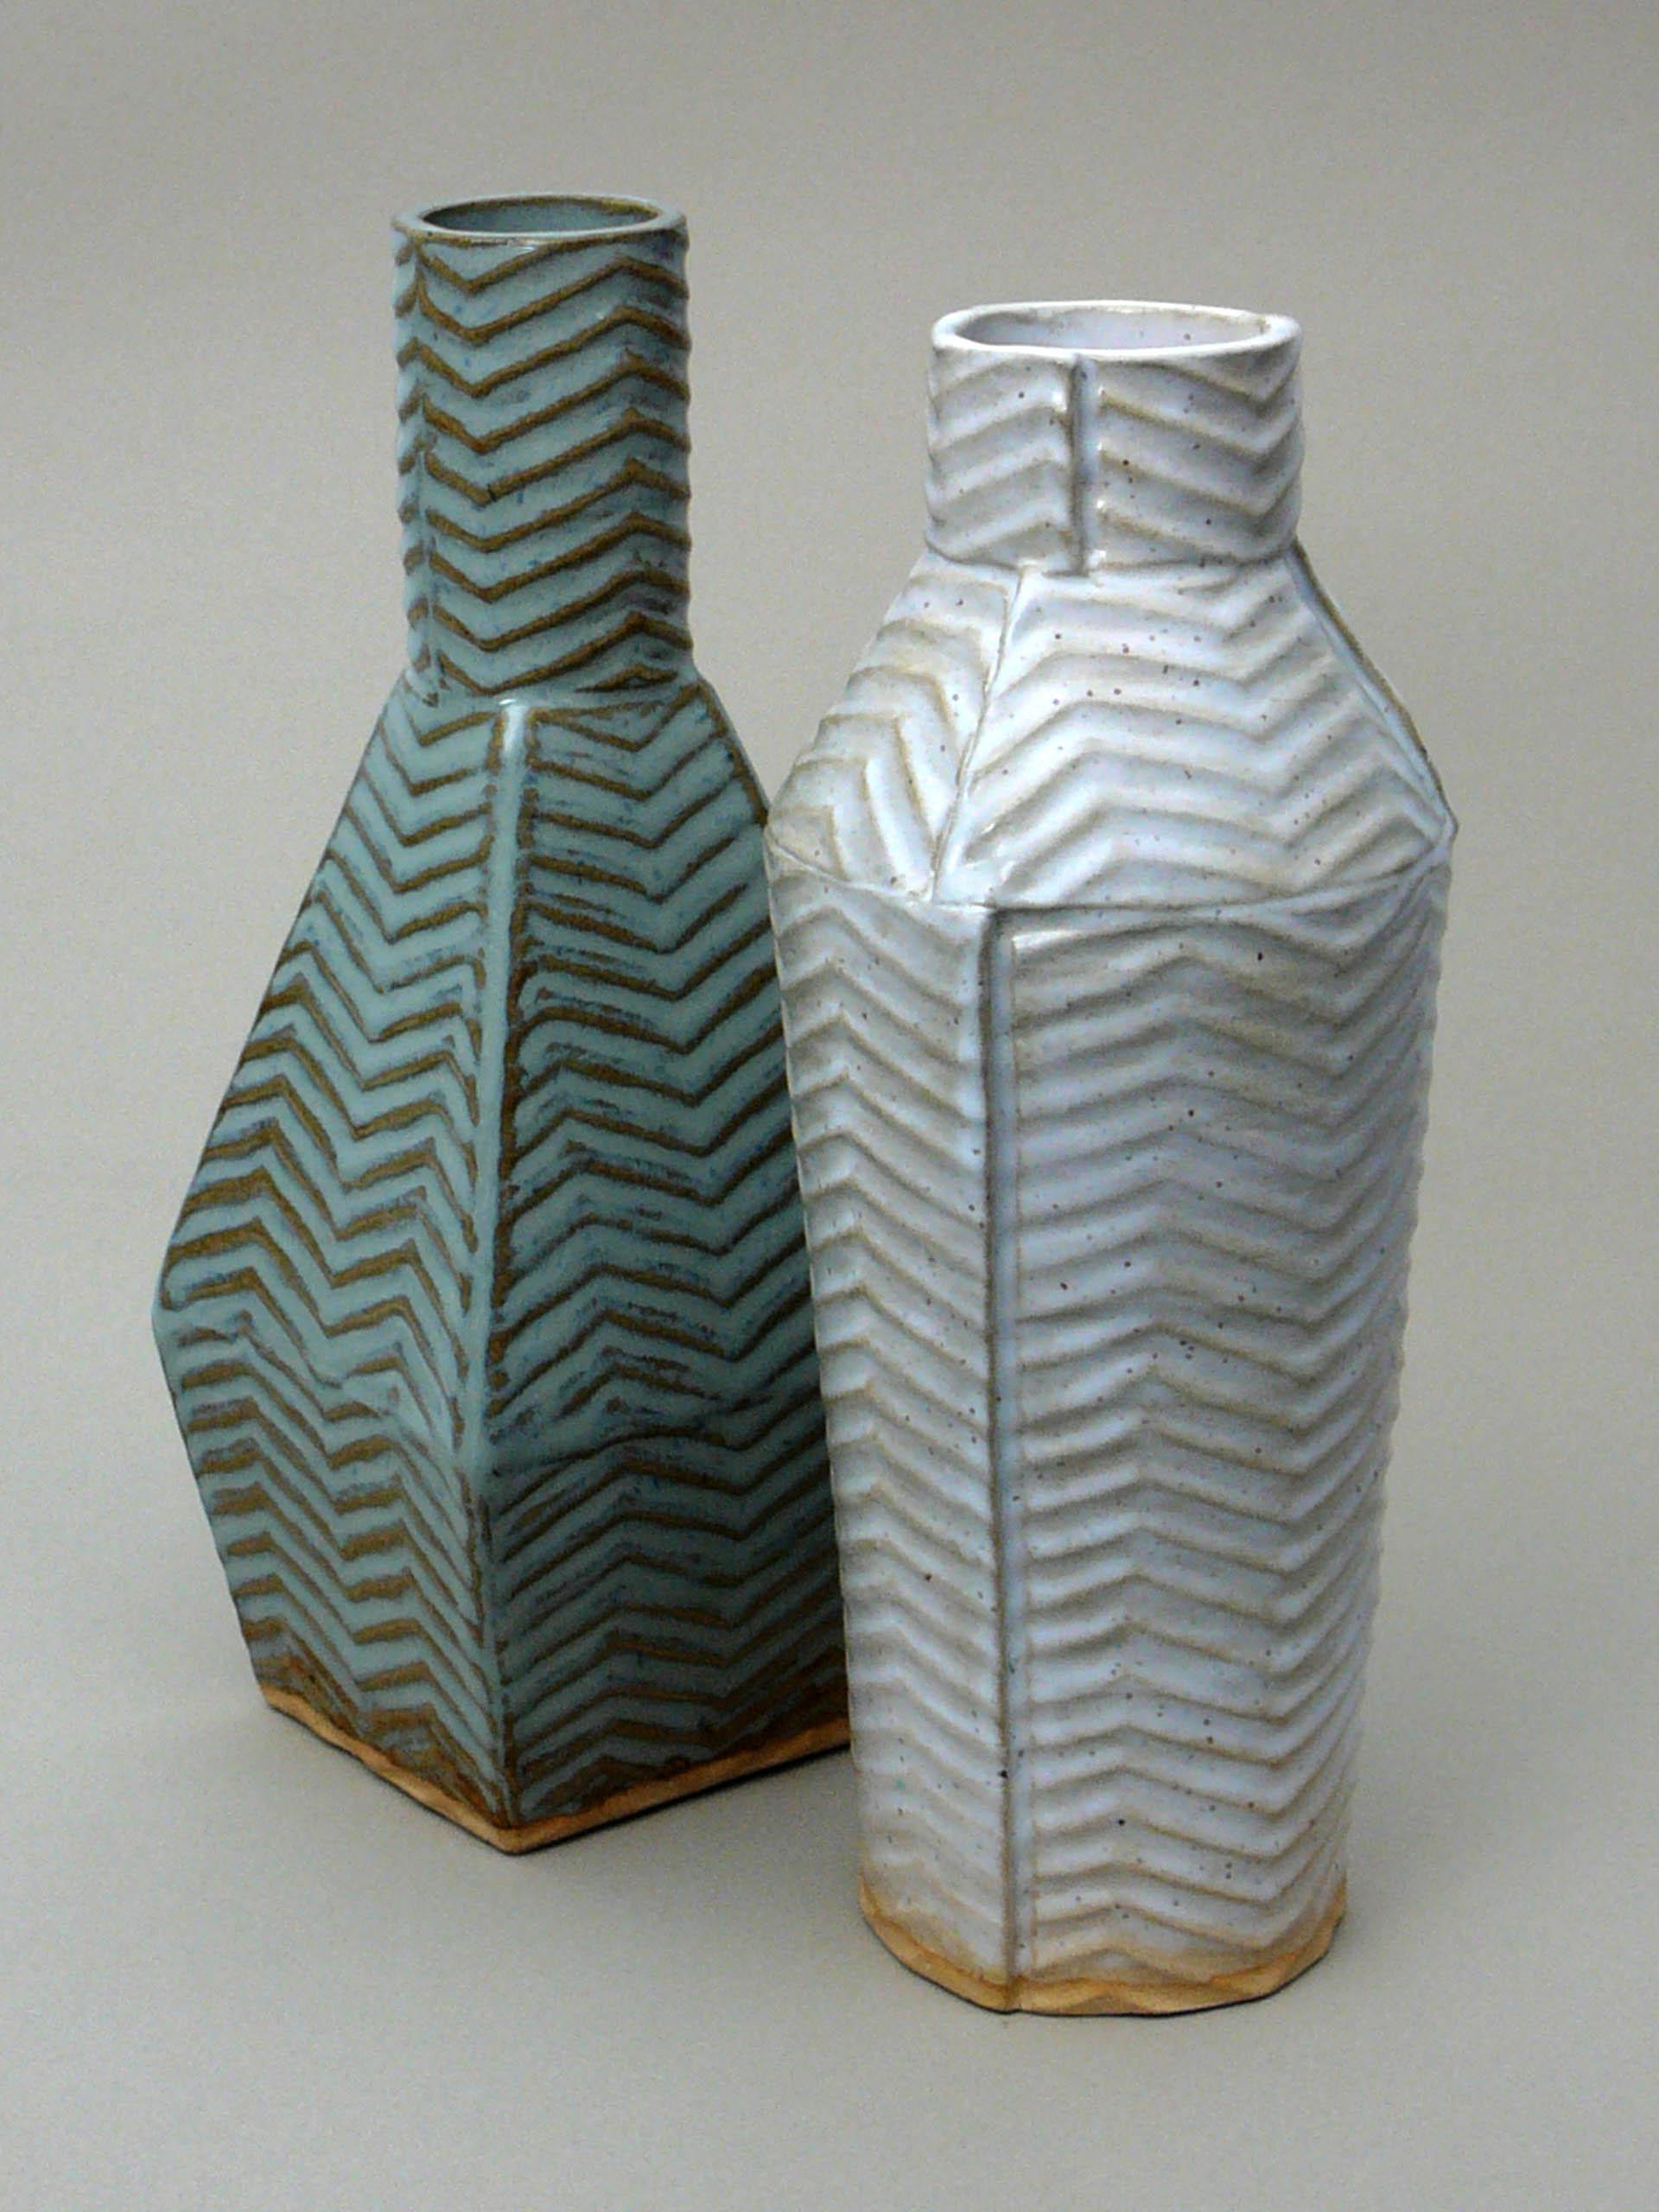 Square Vase and Panel Vase